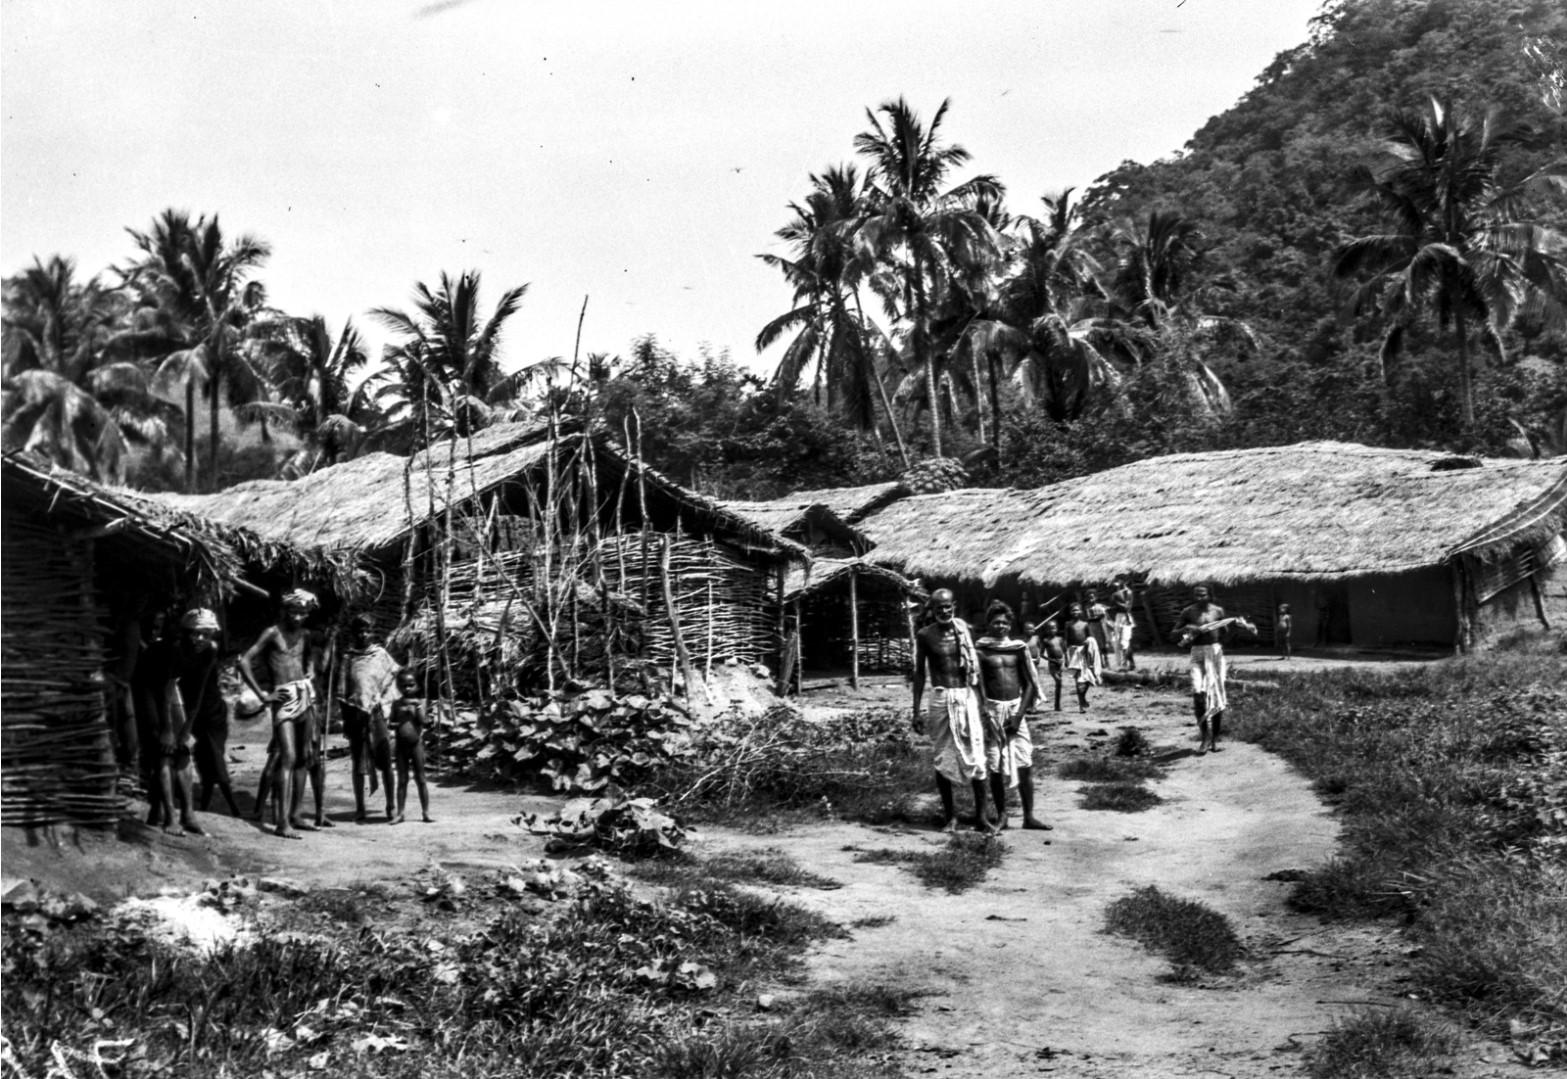 805. Гайба. Вид зданий и жителей деревни